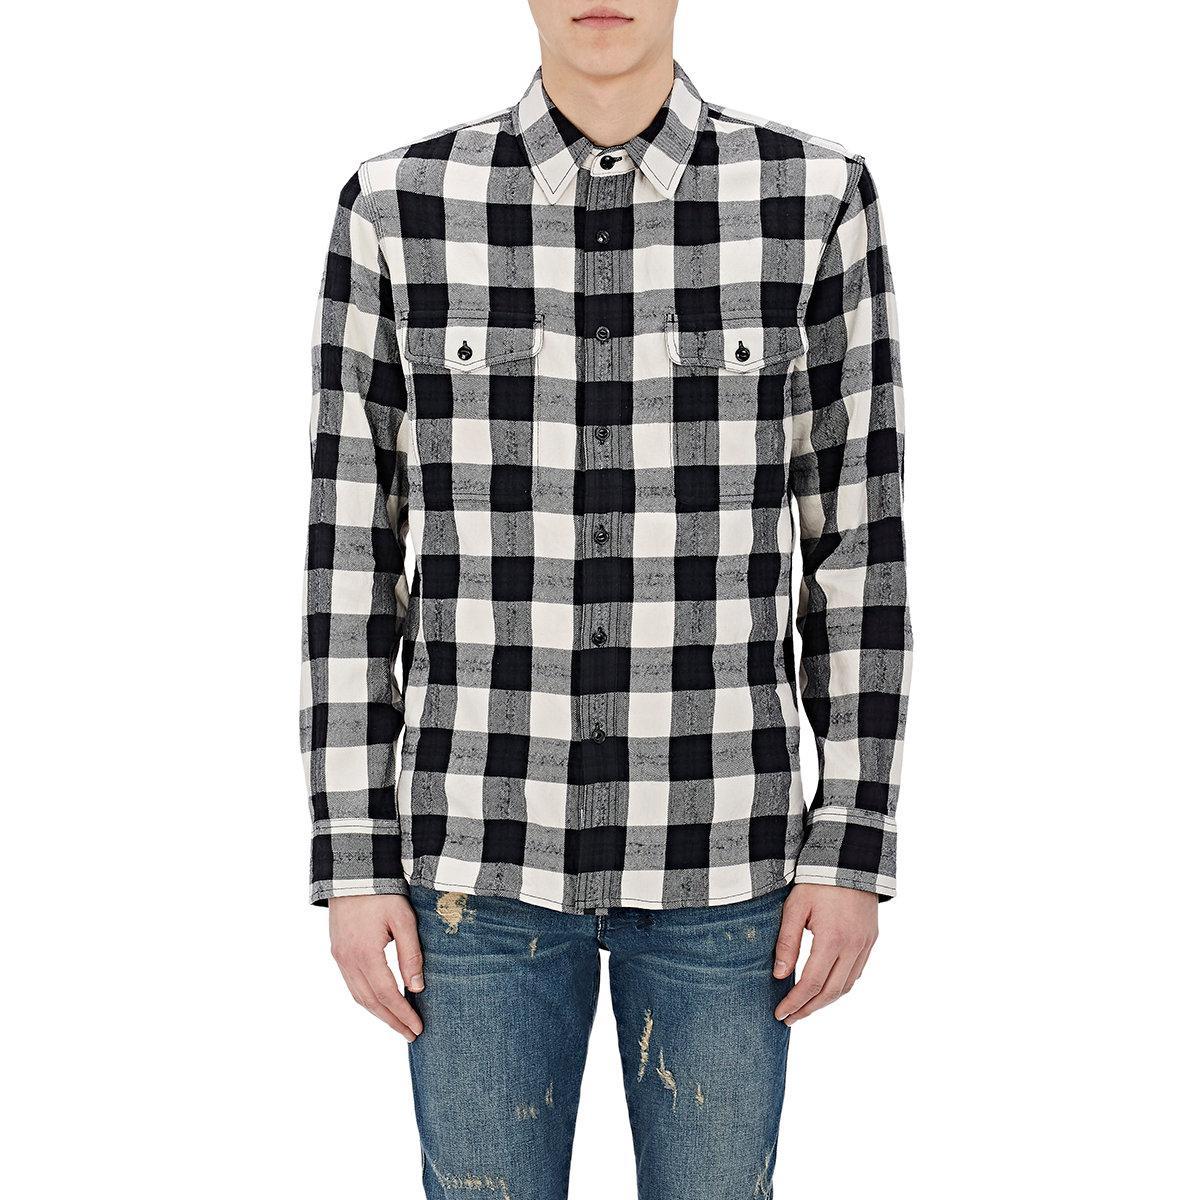 Mens Jack Plaid Cotton Flannel Overshirt Rag & Bone Big Sale For Sale Cheap Sale Limited Edition 2018 Cheap Price Top Quality 56813Rl9